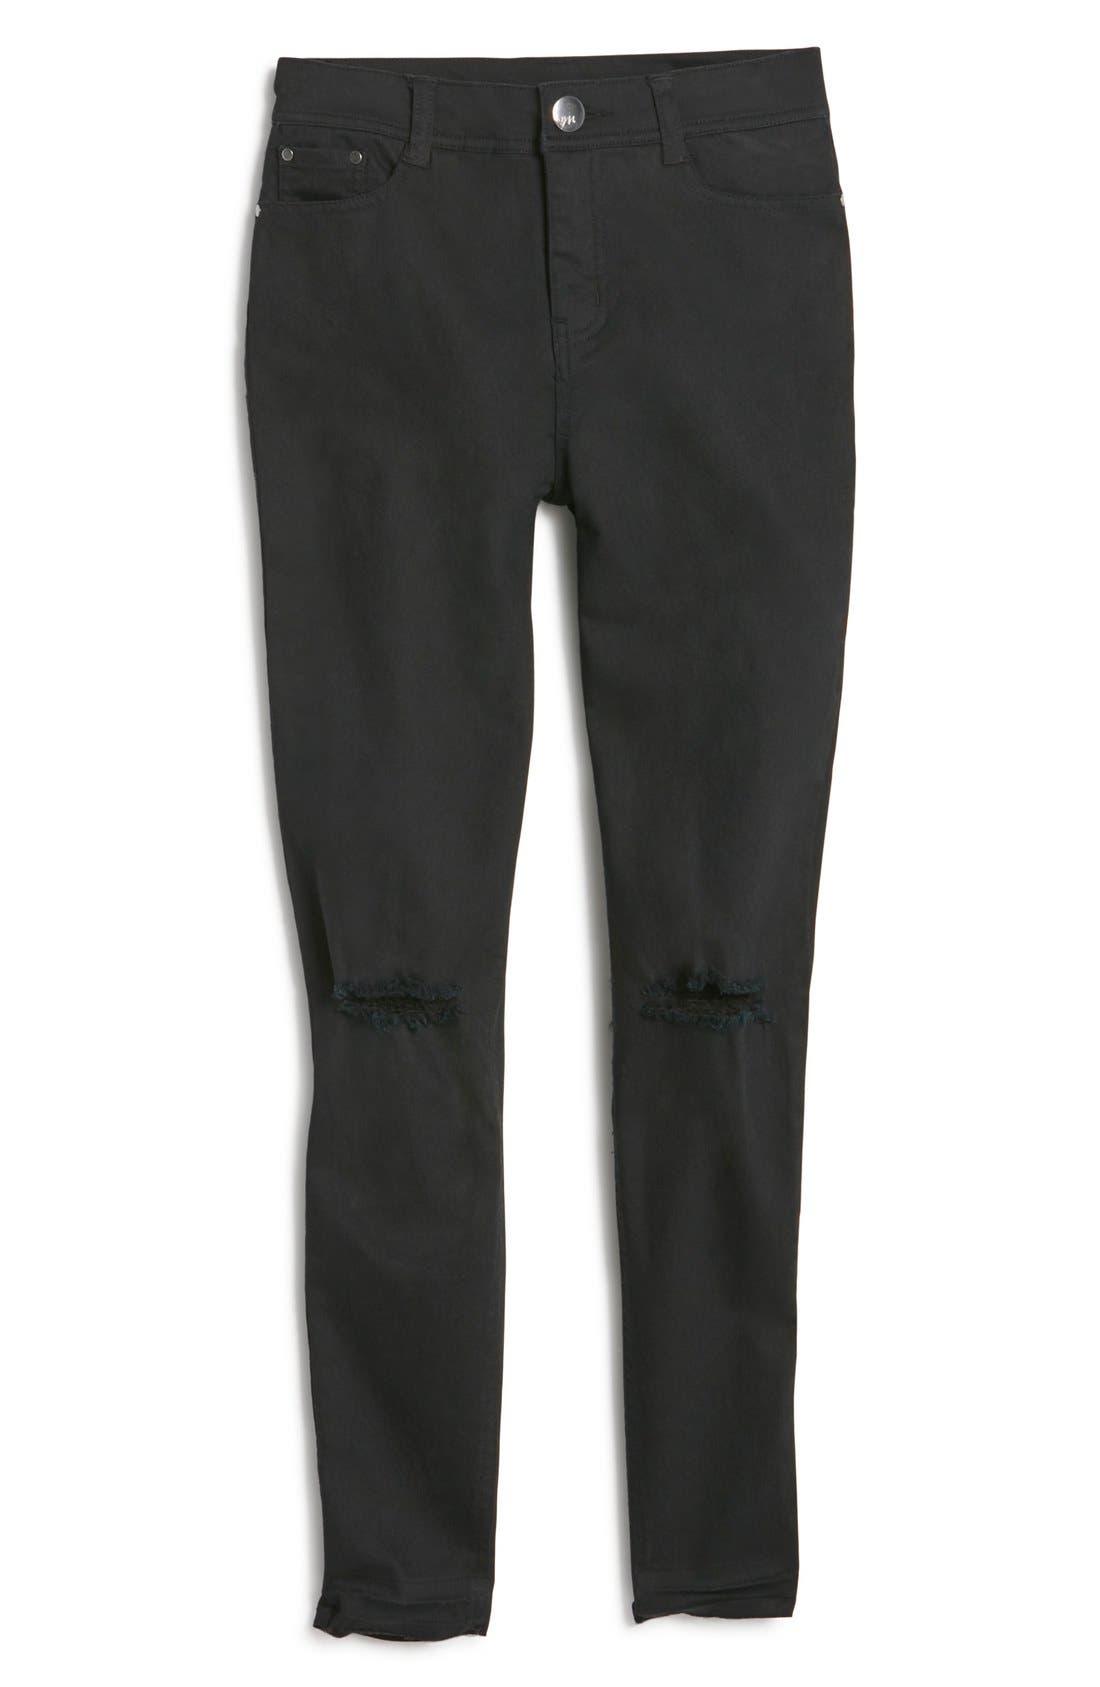 MADDIE High Waist Distressed Skinny Jeans